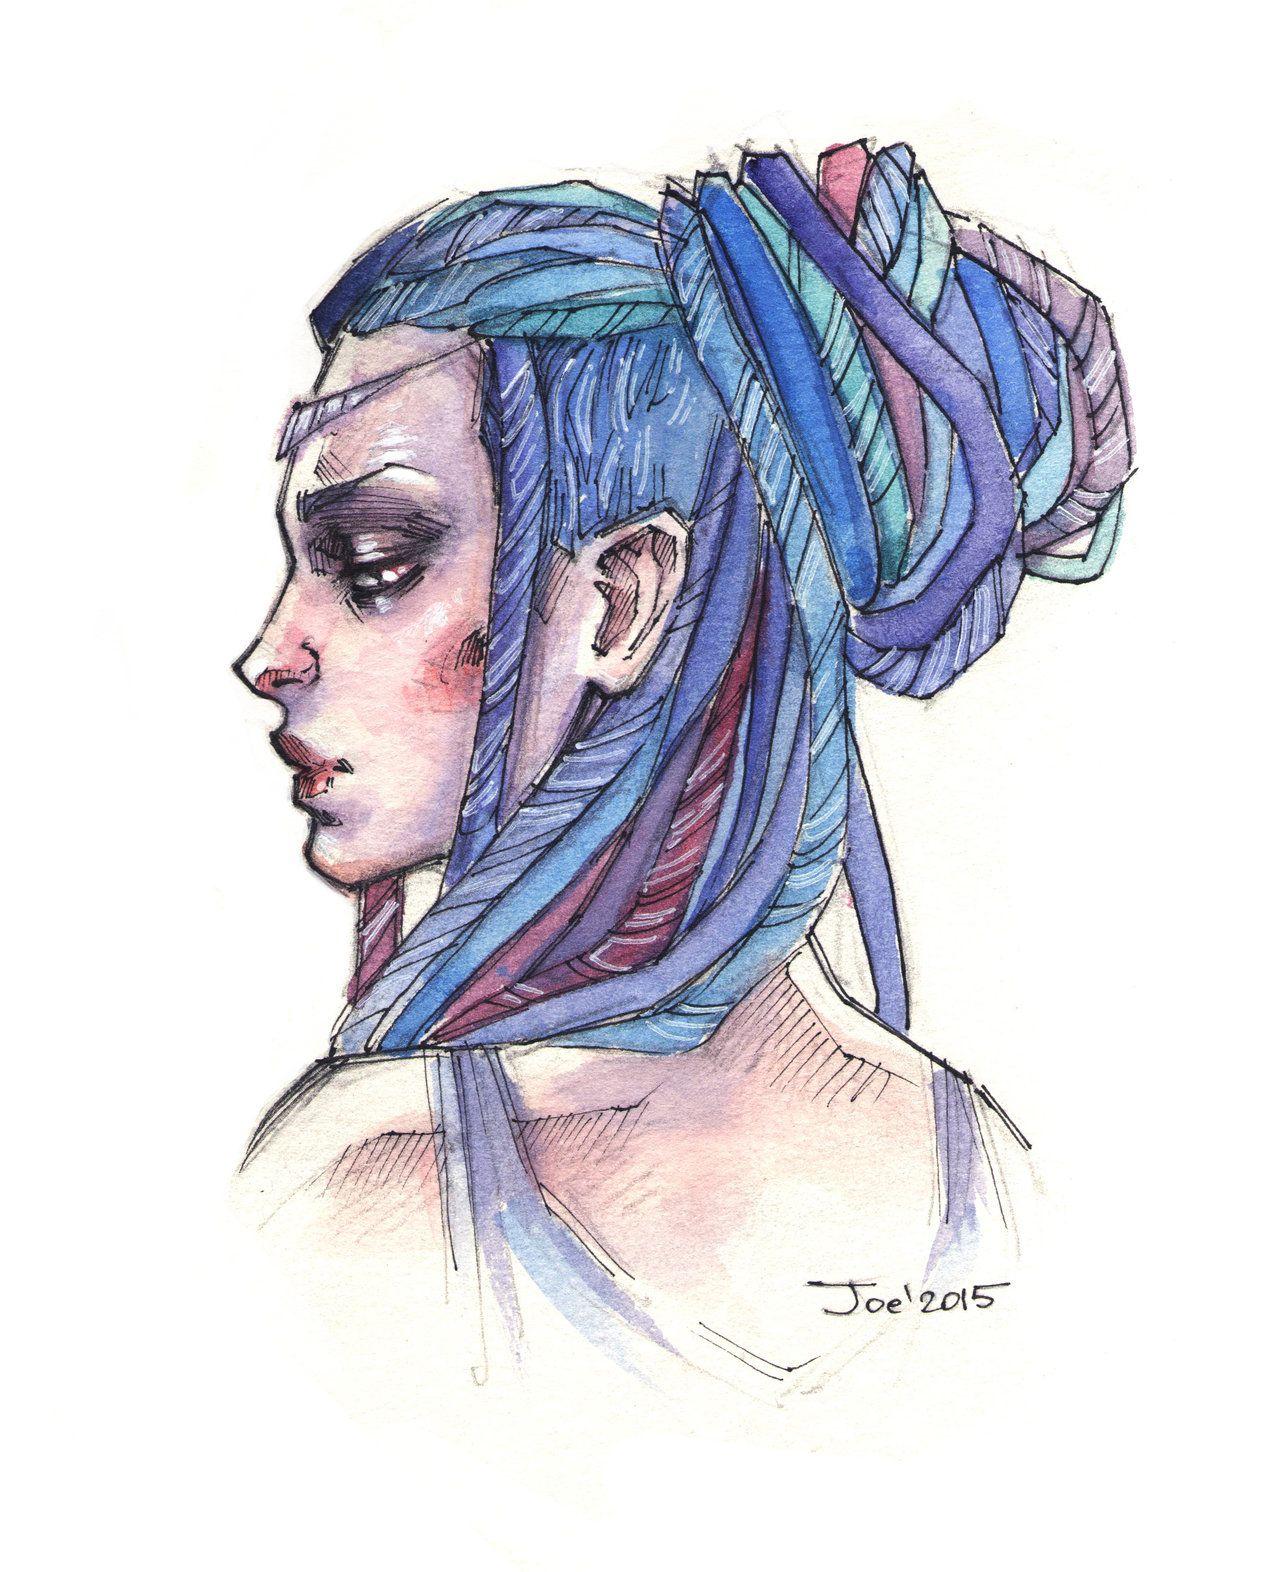 1045 By Sashajoe Female Gipsy Priestess Shaman Voodoo Dreads Dreadlocks  Crown Witch Armor Clothes Clothing Fashion